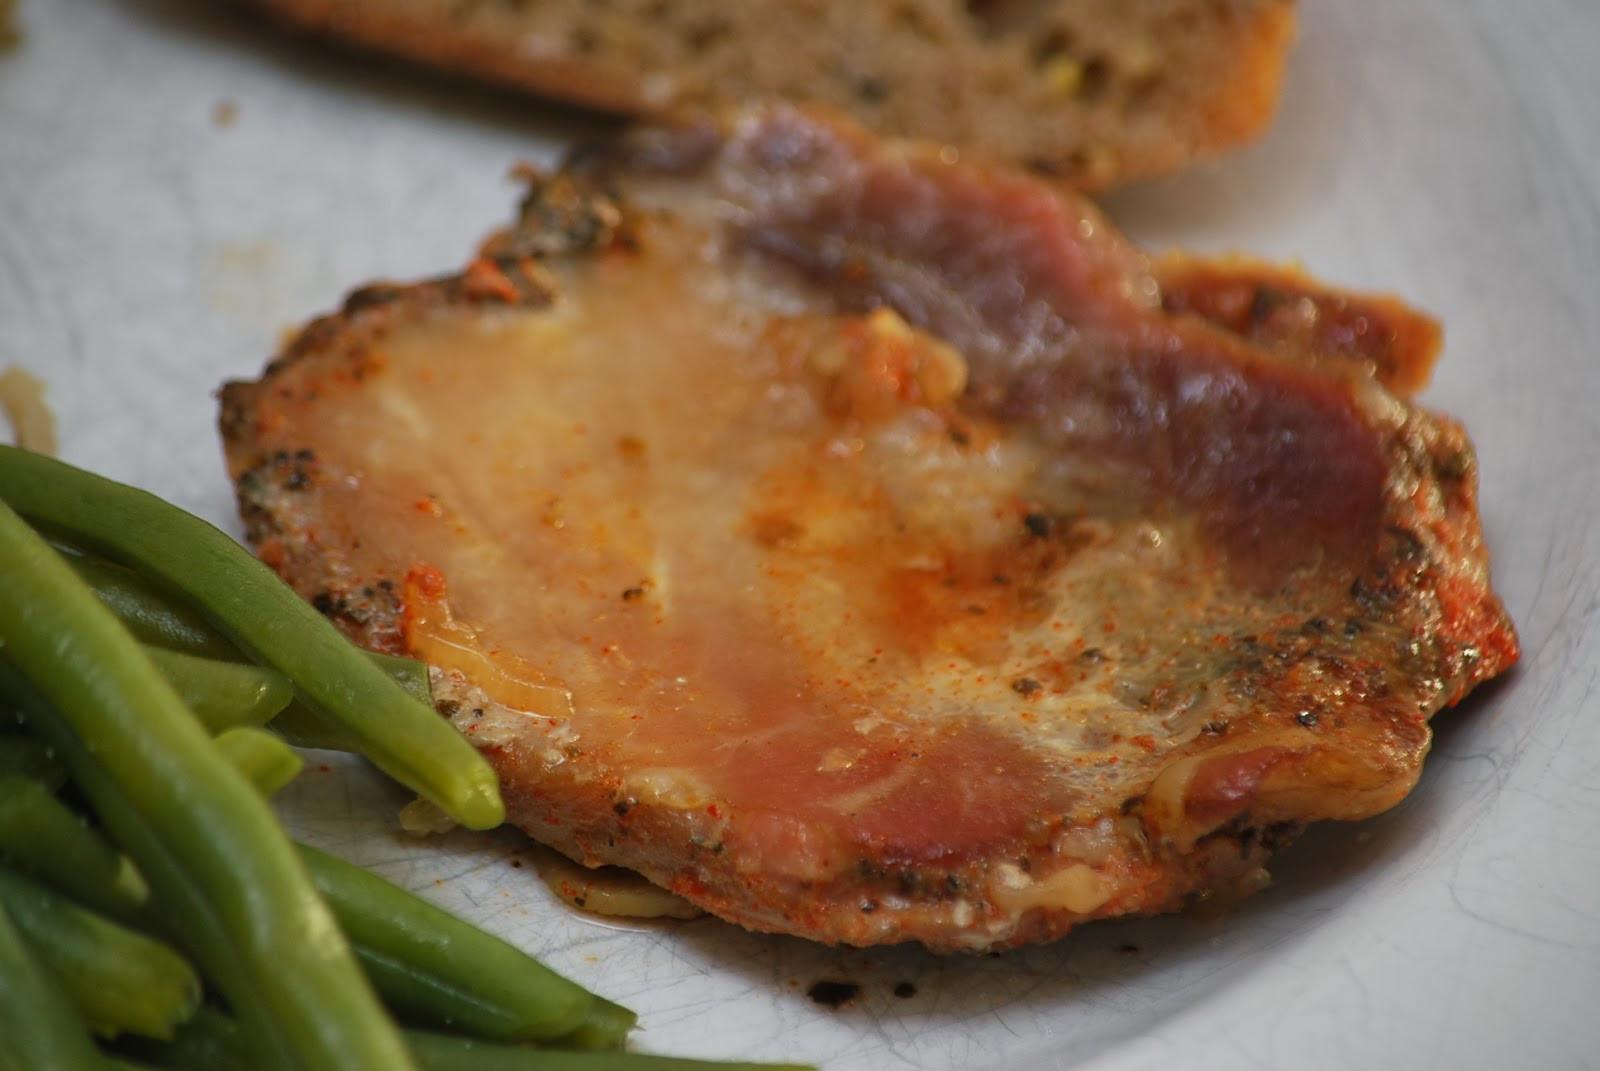 Crockpot Pork Chops  My story in recipes Crock Pot Pork Chops